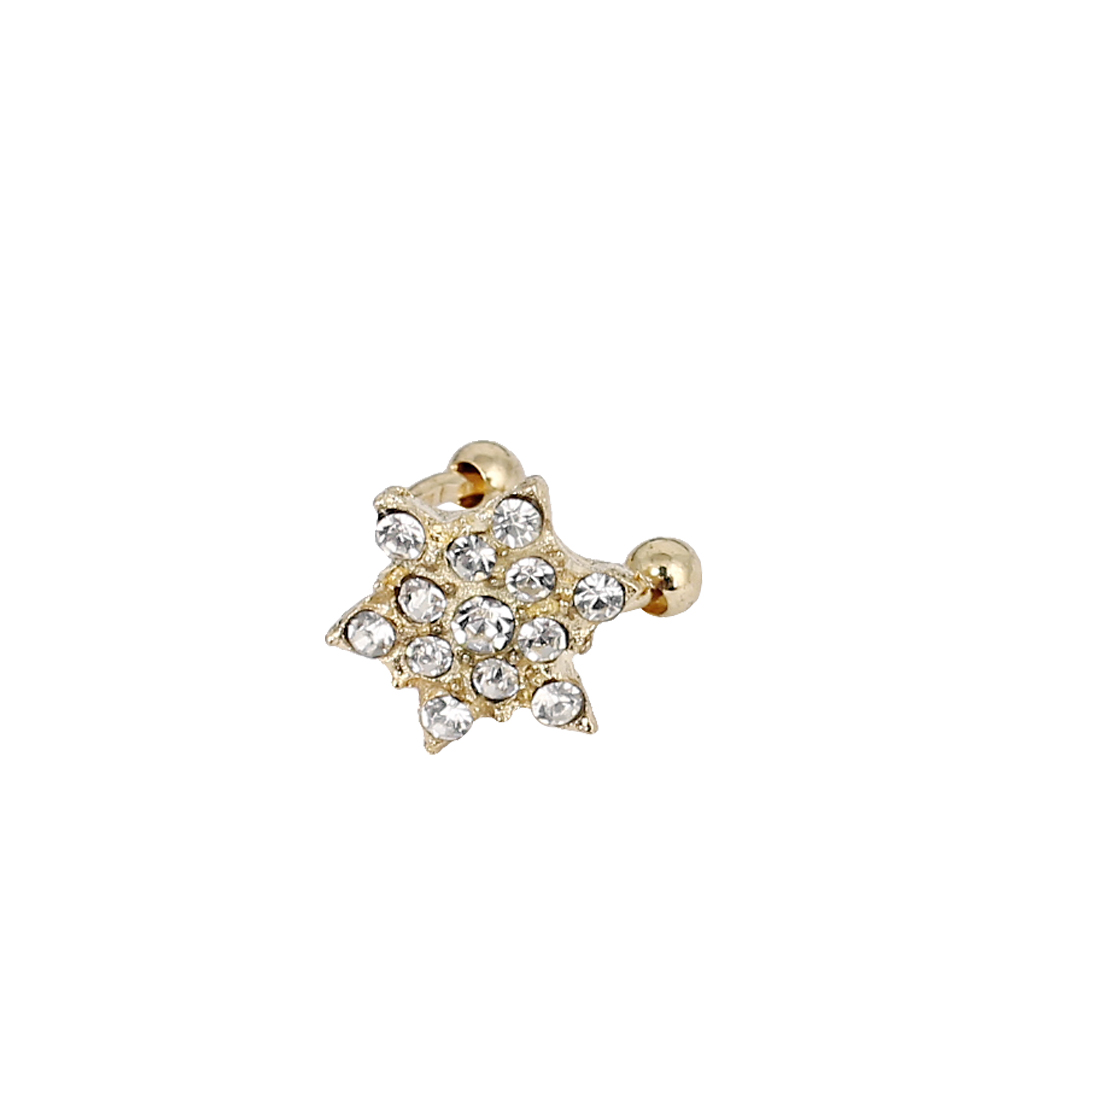 Faux Rhinestone Snowflake Non-pierced Ear Bone Cuff Clip-on Earring Gold Tone